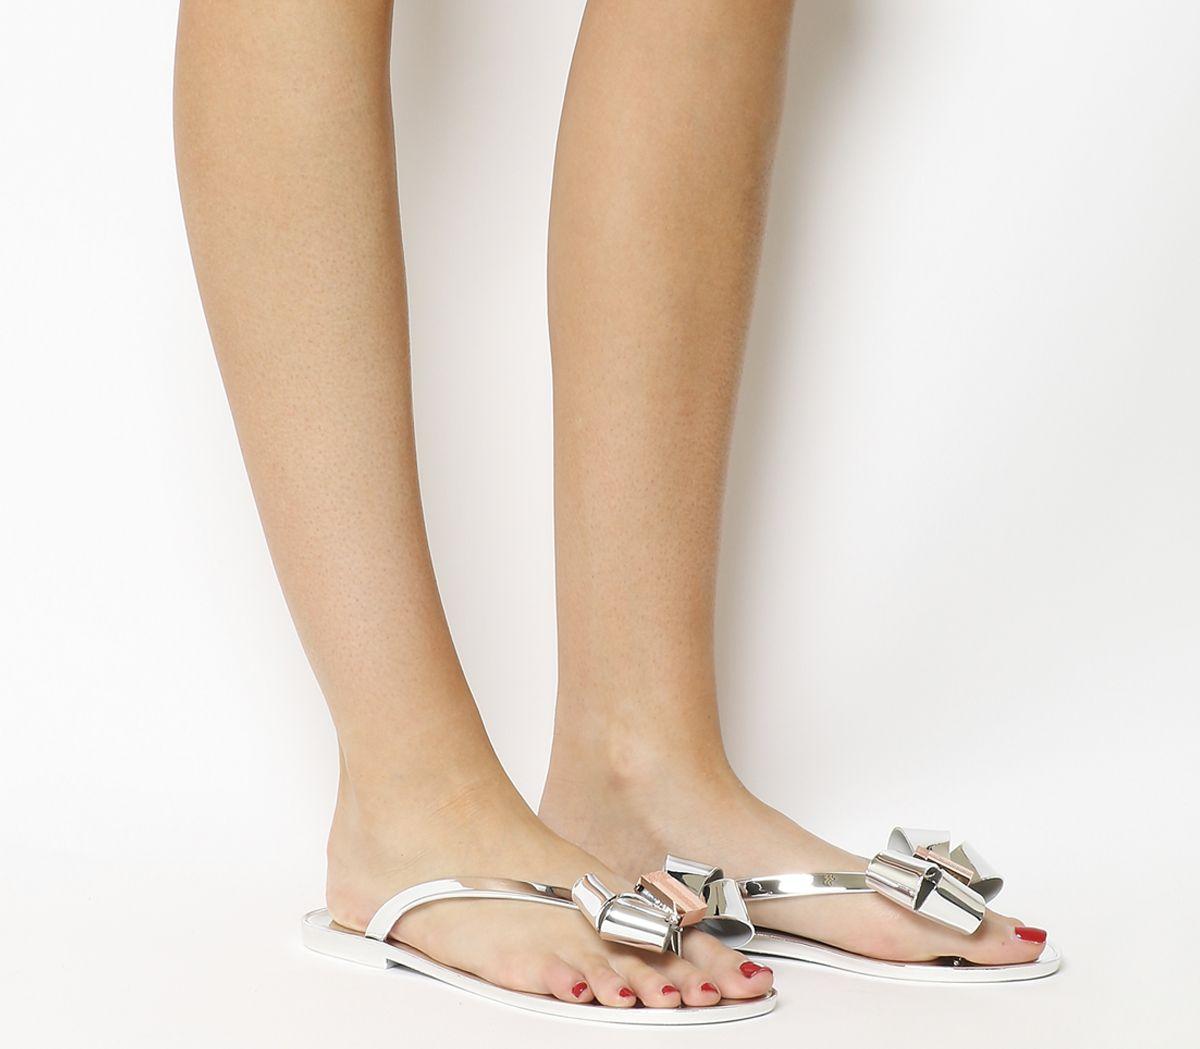 dd356efea Ted Baker Glamari Flip Flops Silver - Sandals